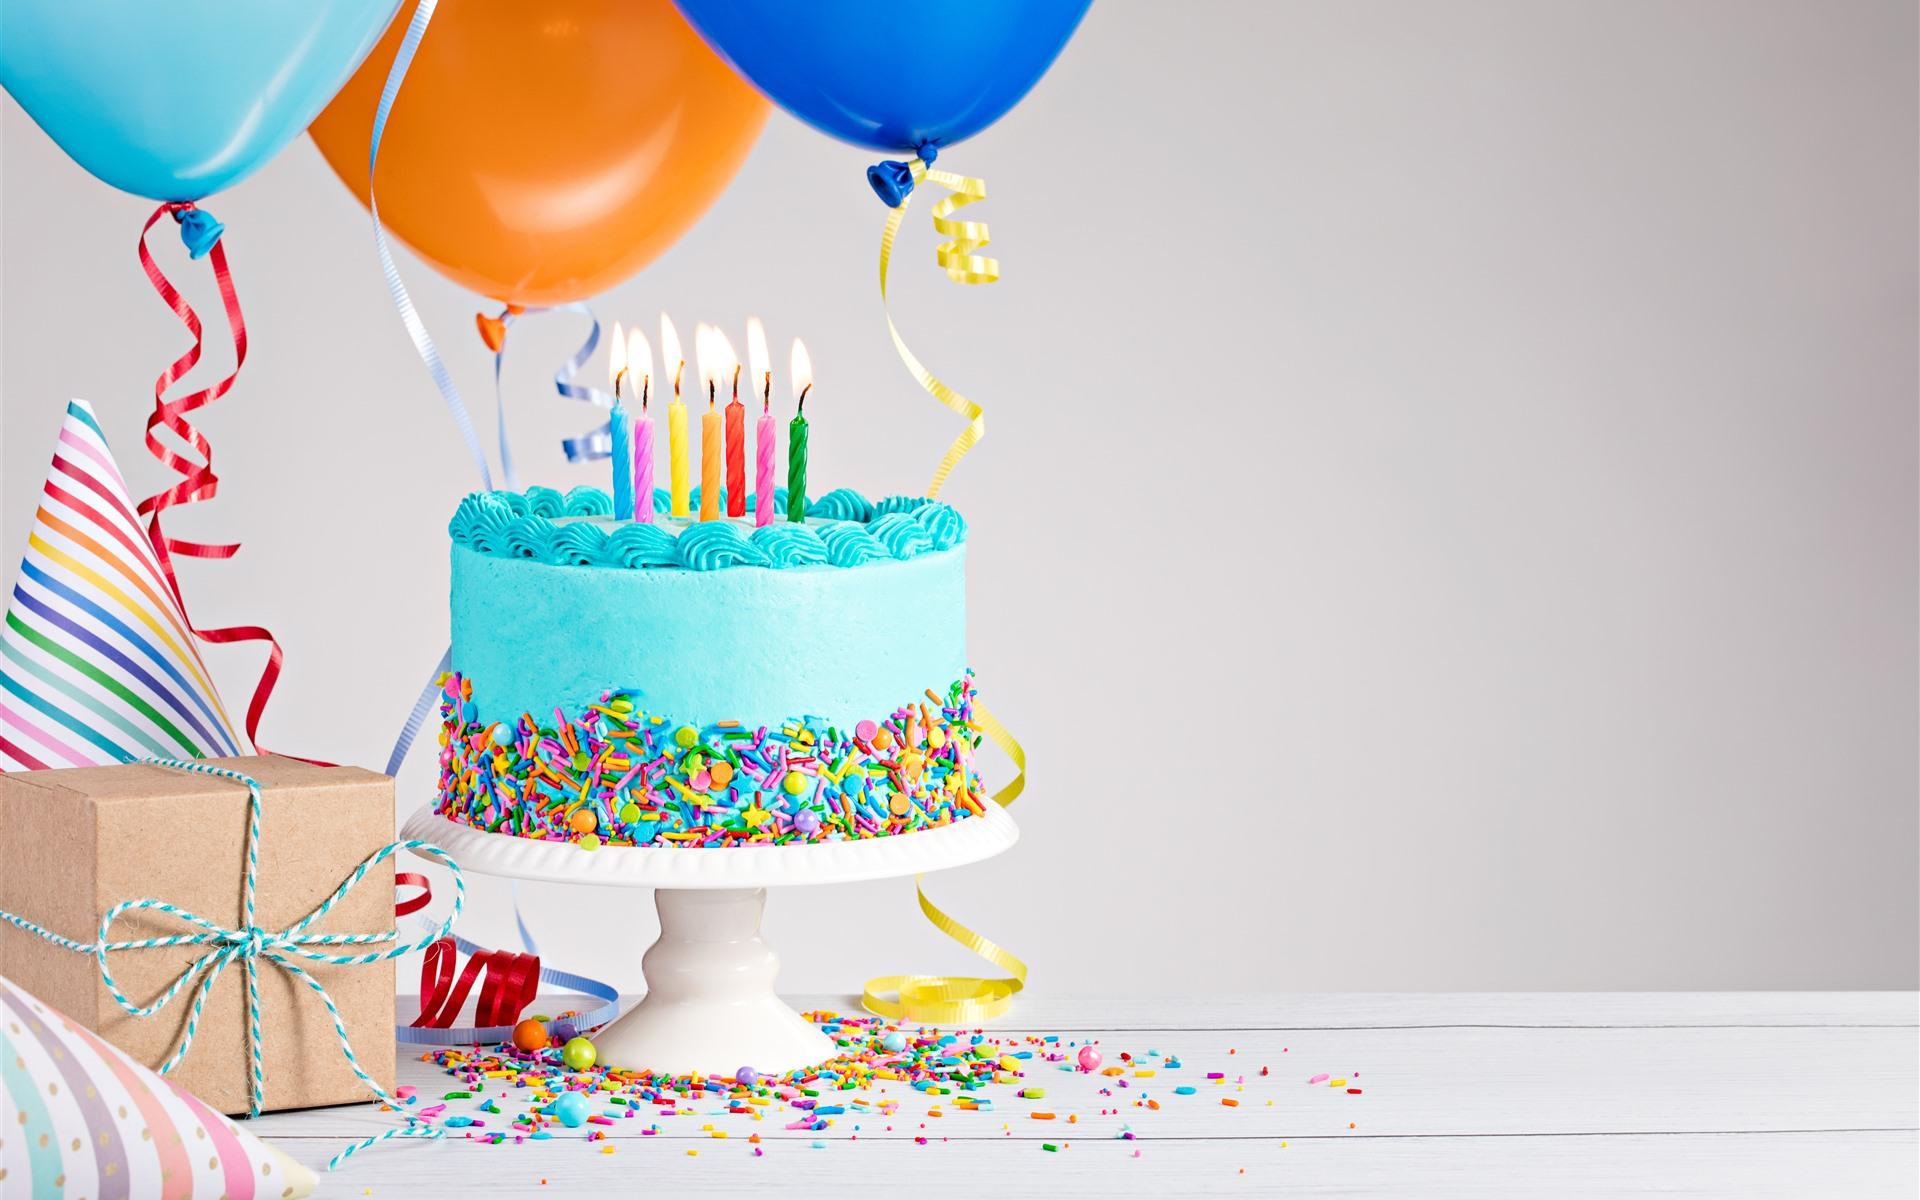 Открытка ко дню рождения предприятия